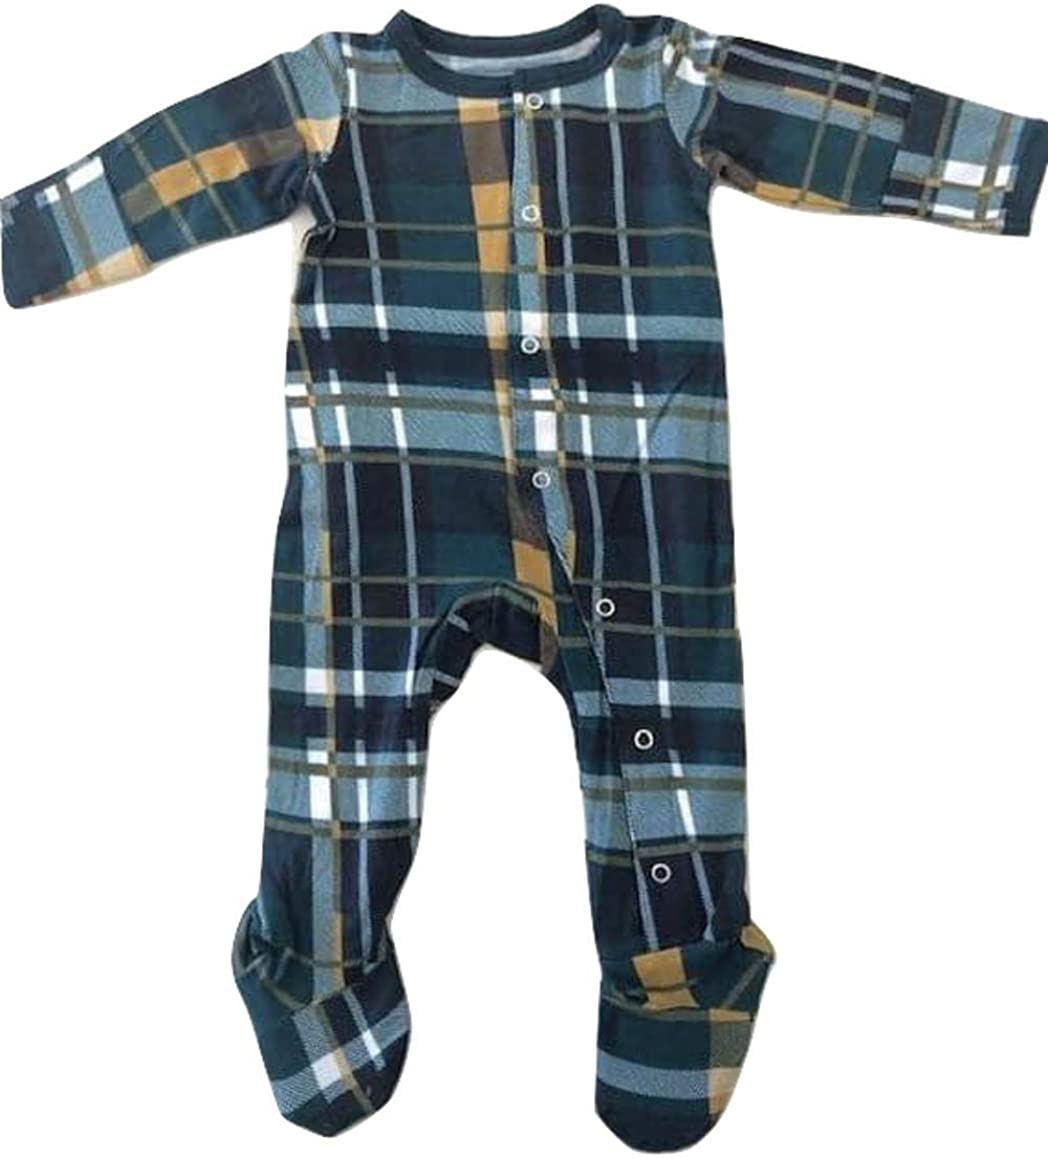 Bamboo Clothing Infant Boys Kozi /& Co Baby Sleeper Newborn Footie Pajamas by